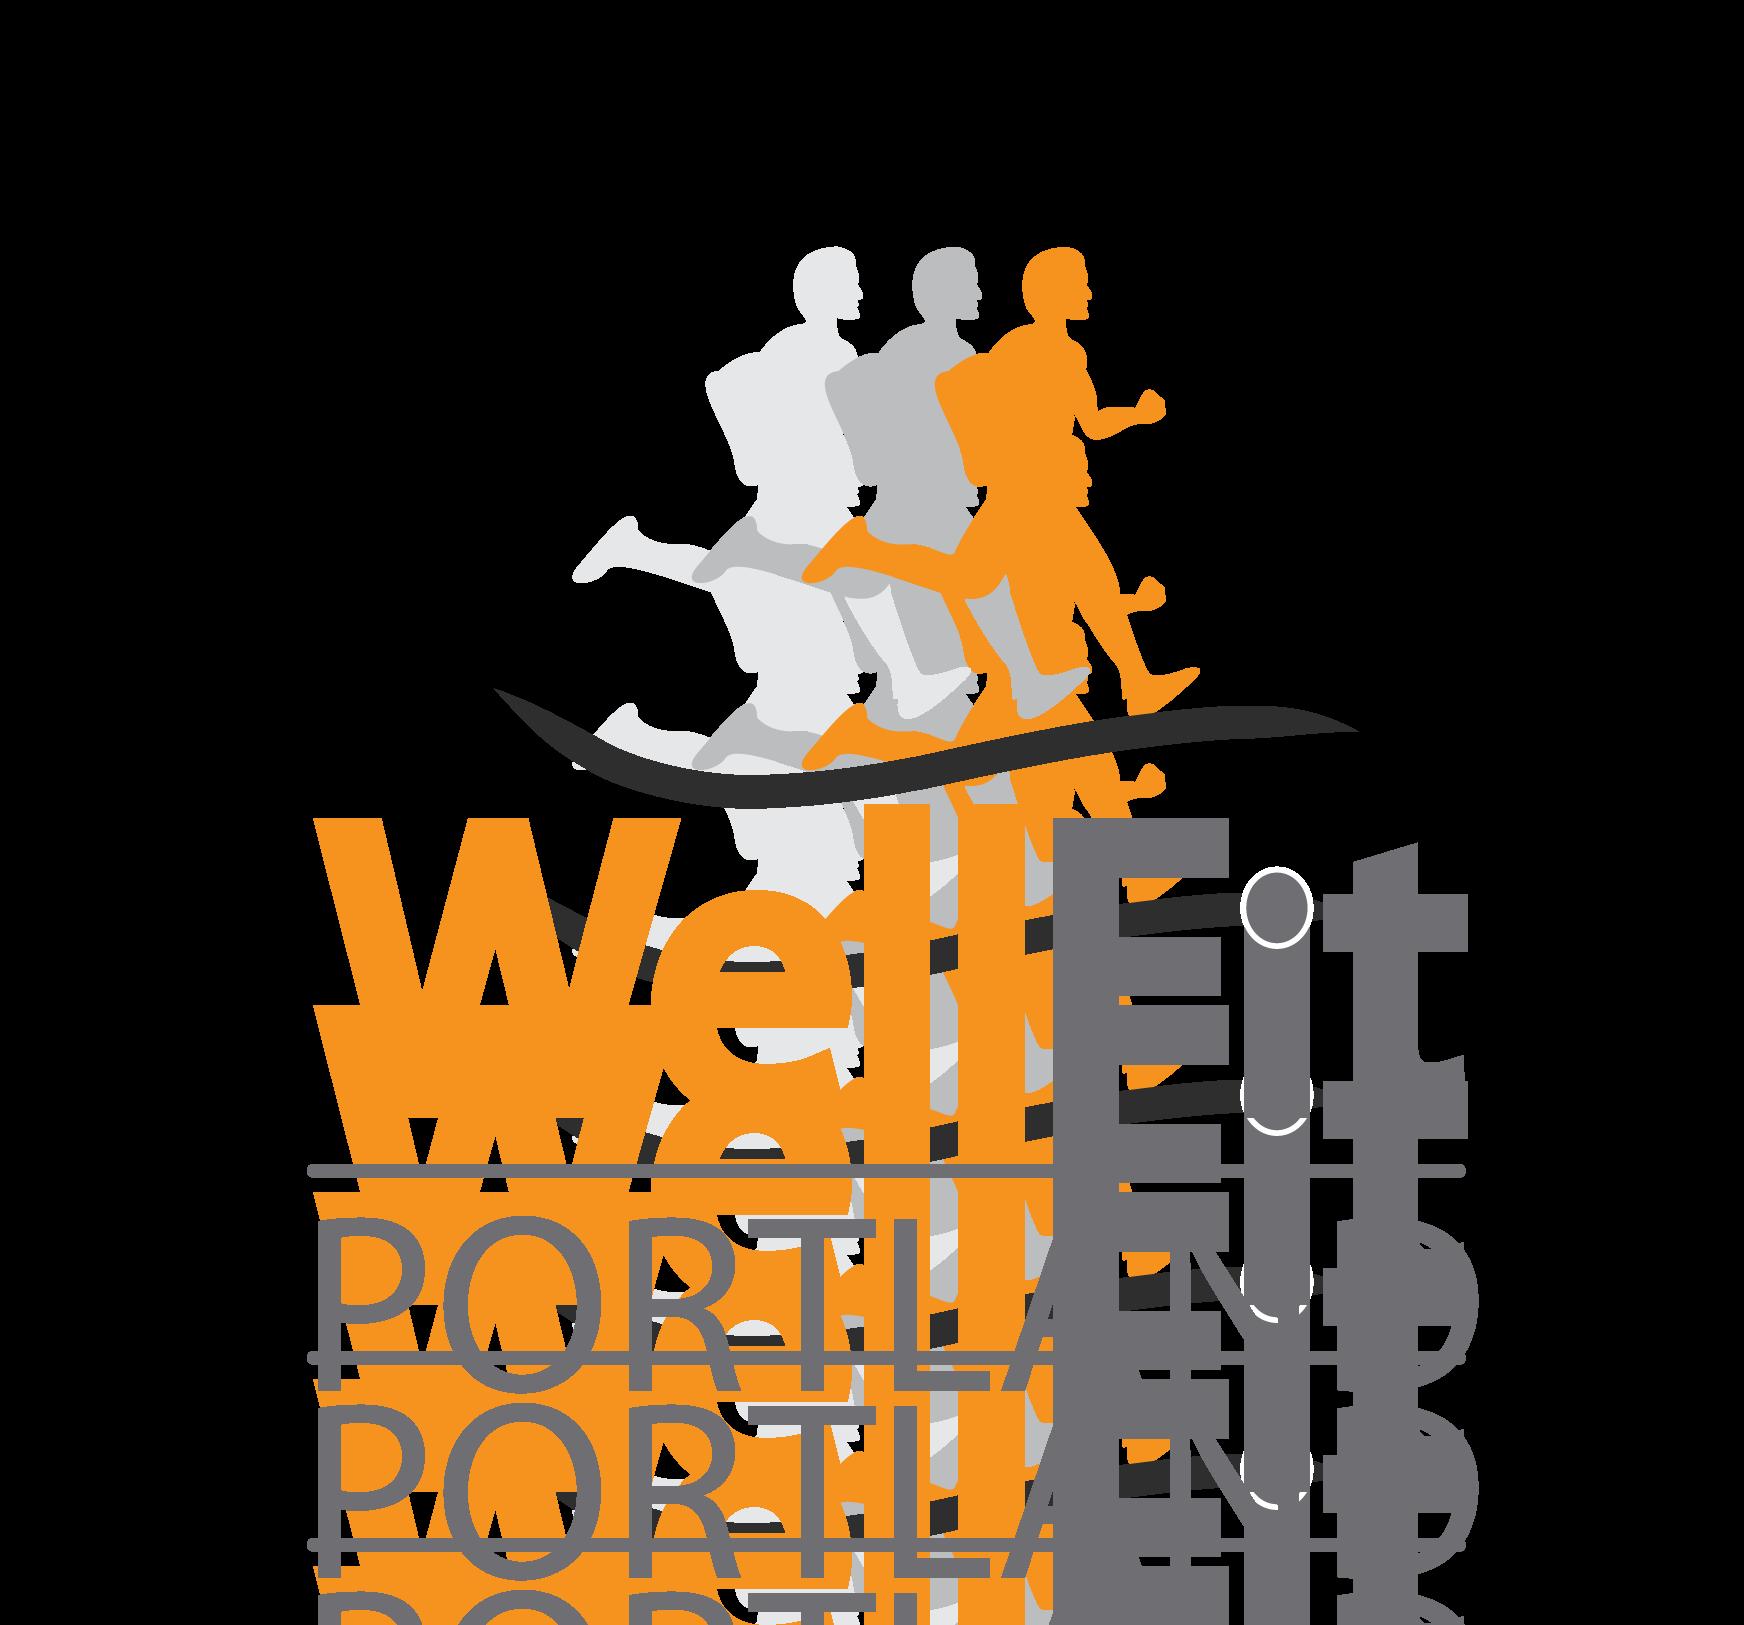 Wellfit 01